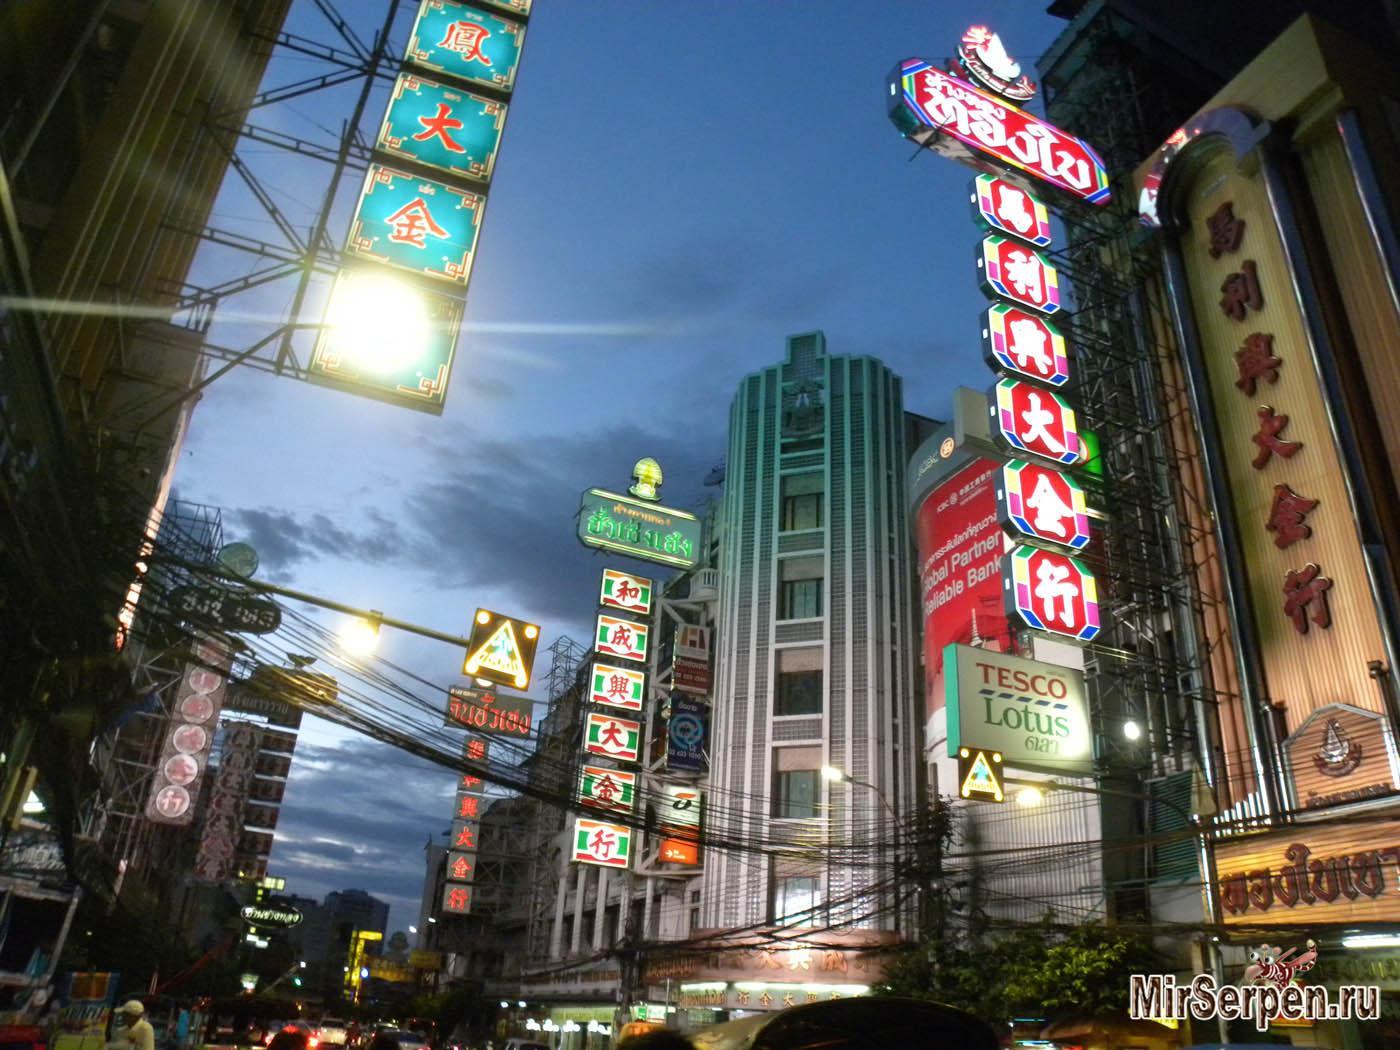 Фото дня: China Town, Бангкок, Таиланд